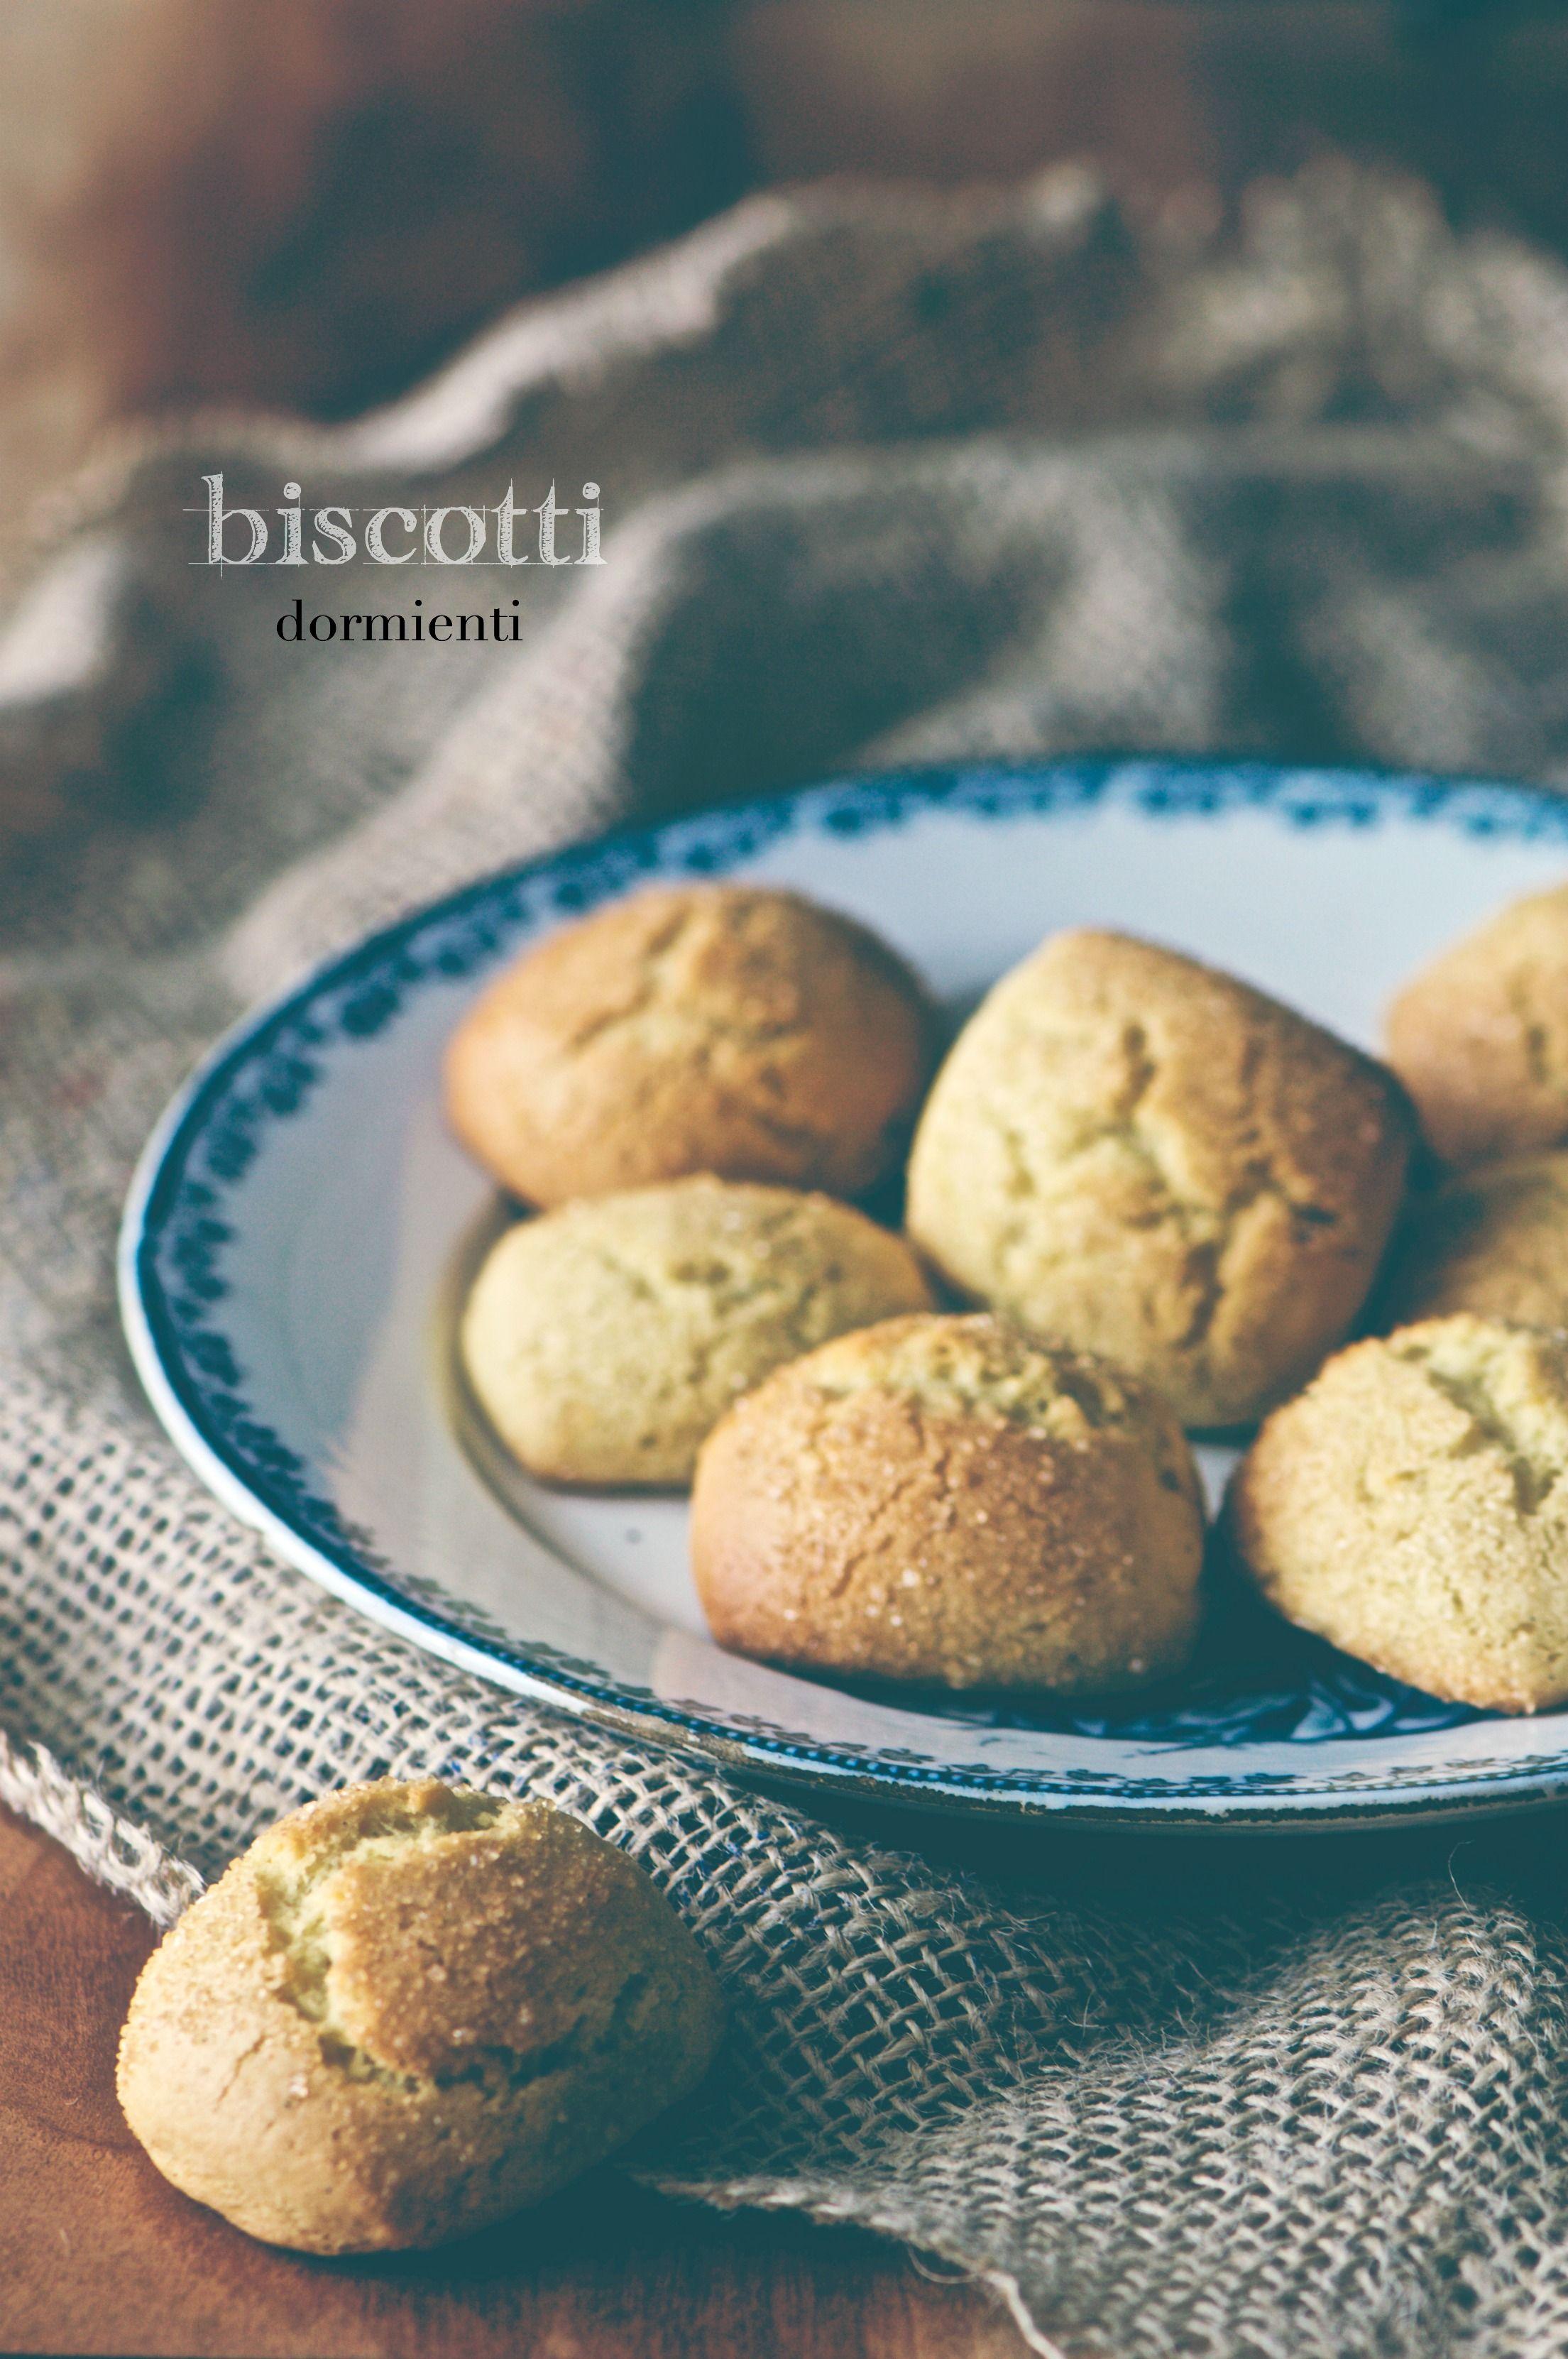 Biscotti dormienti  Cookies